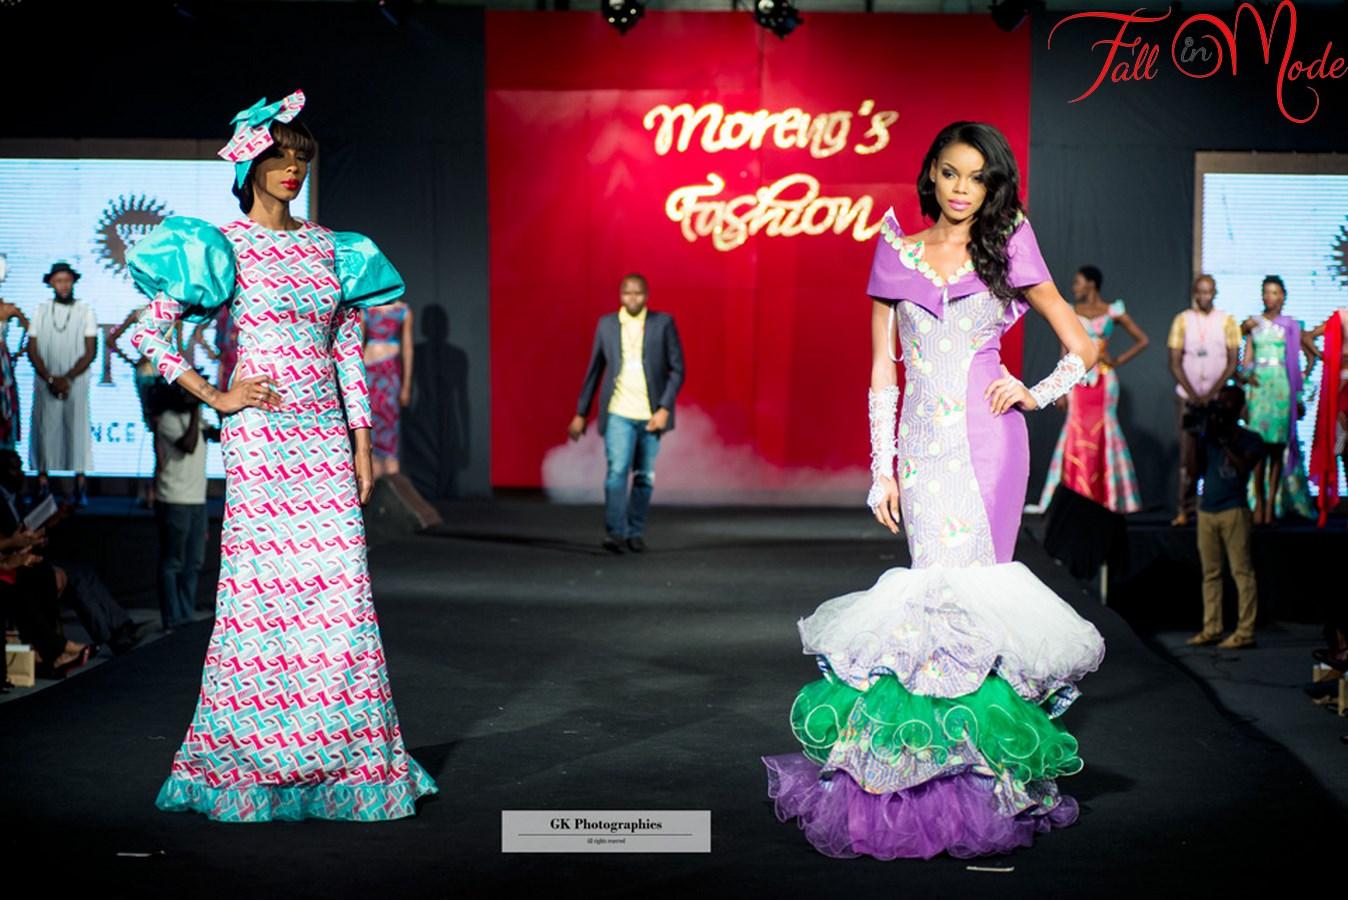 moreno's fashion_decembre_2015_vlisco_moses_by_style